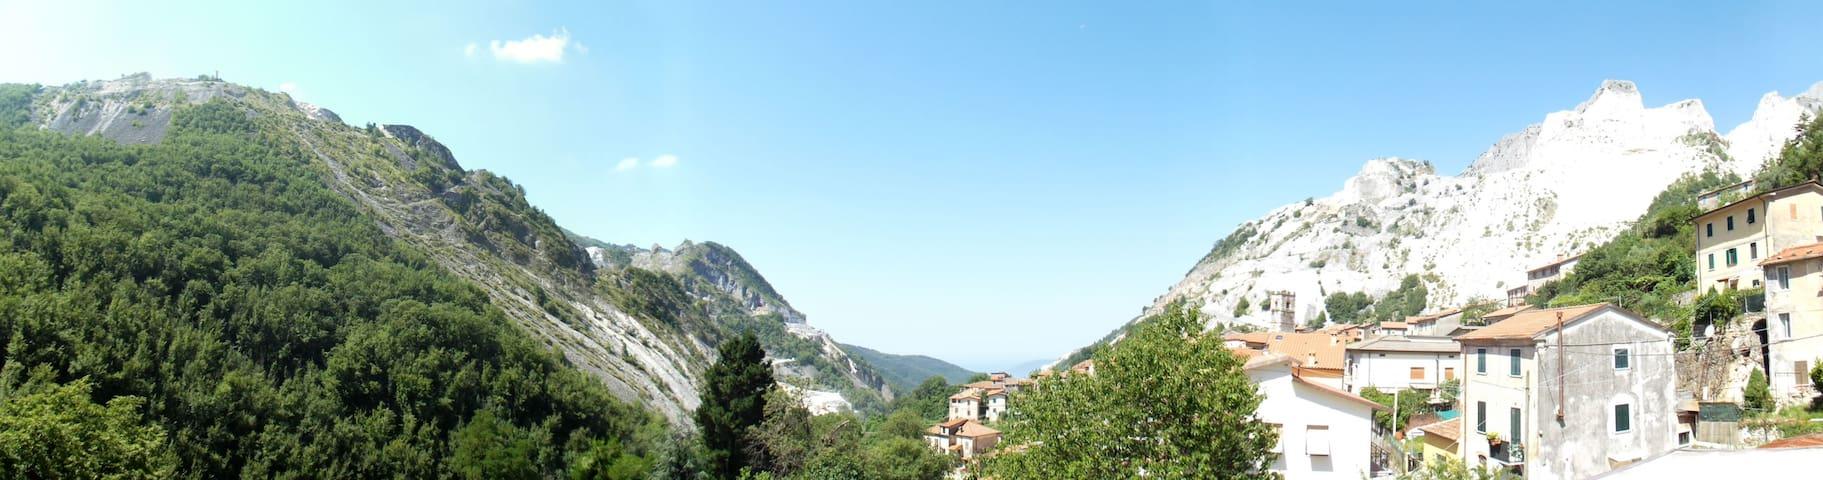 Nel cuore delle Alpi  Apuane - Colonnata - Leilighet